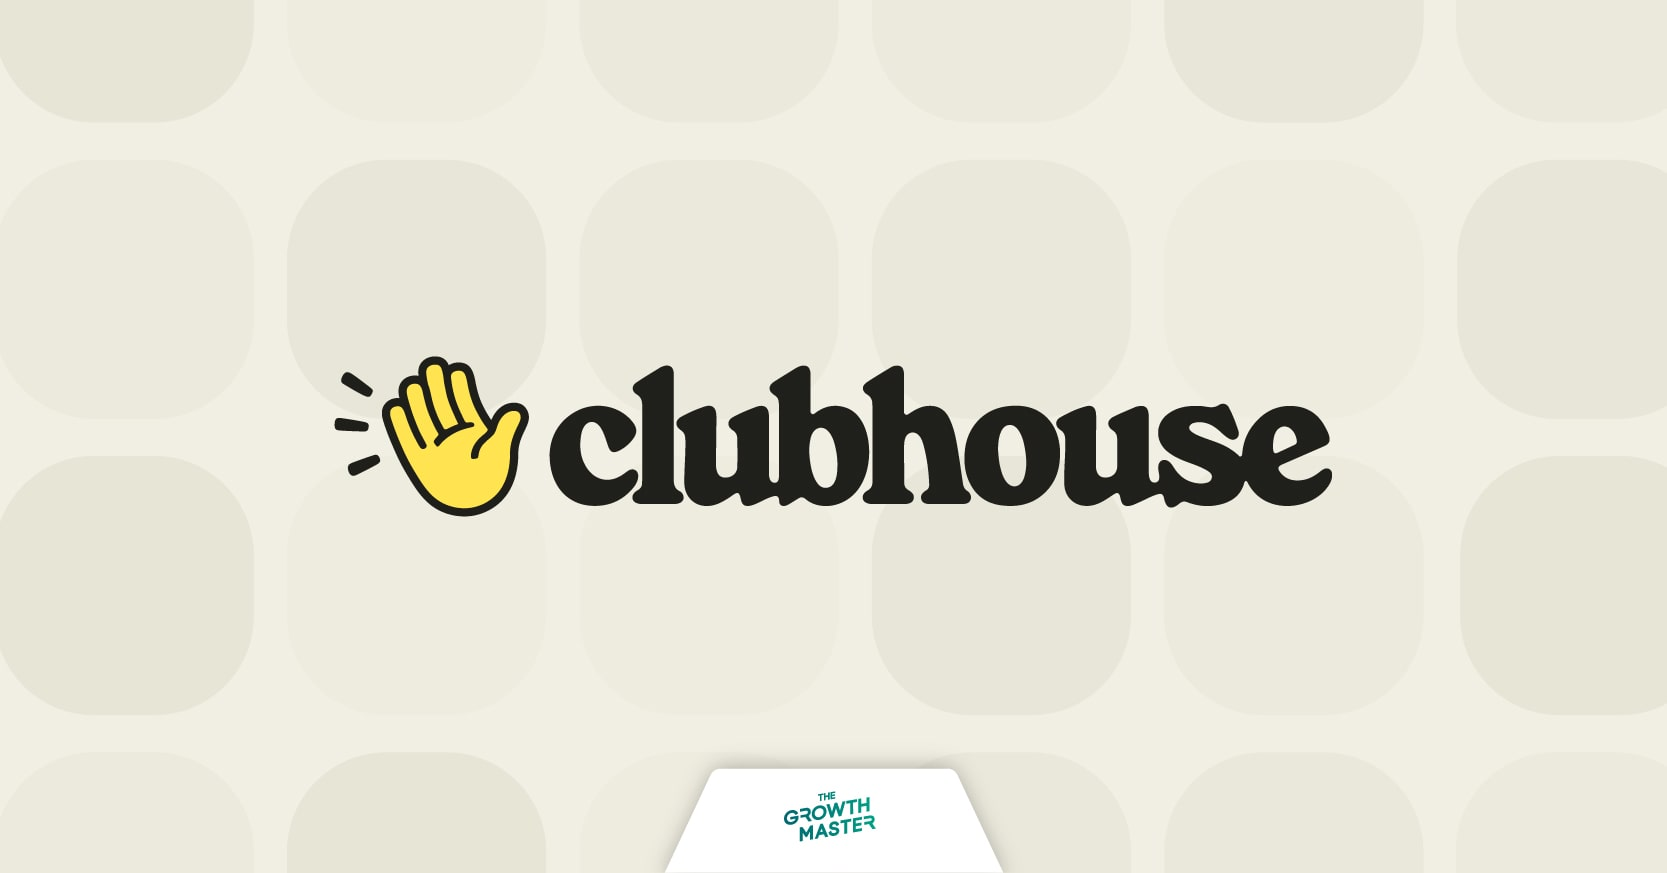 CASE STUDY: Clubhouse ทำอย่างไรถึงมีมูลค่า 4 พันล้านเหรียญ แม้ไม่มีโมเดลการสร้างรายได้?